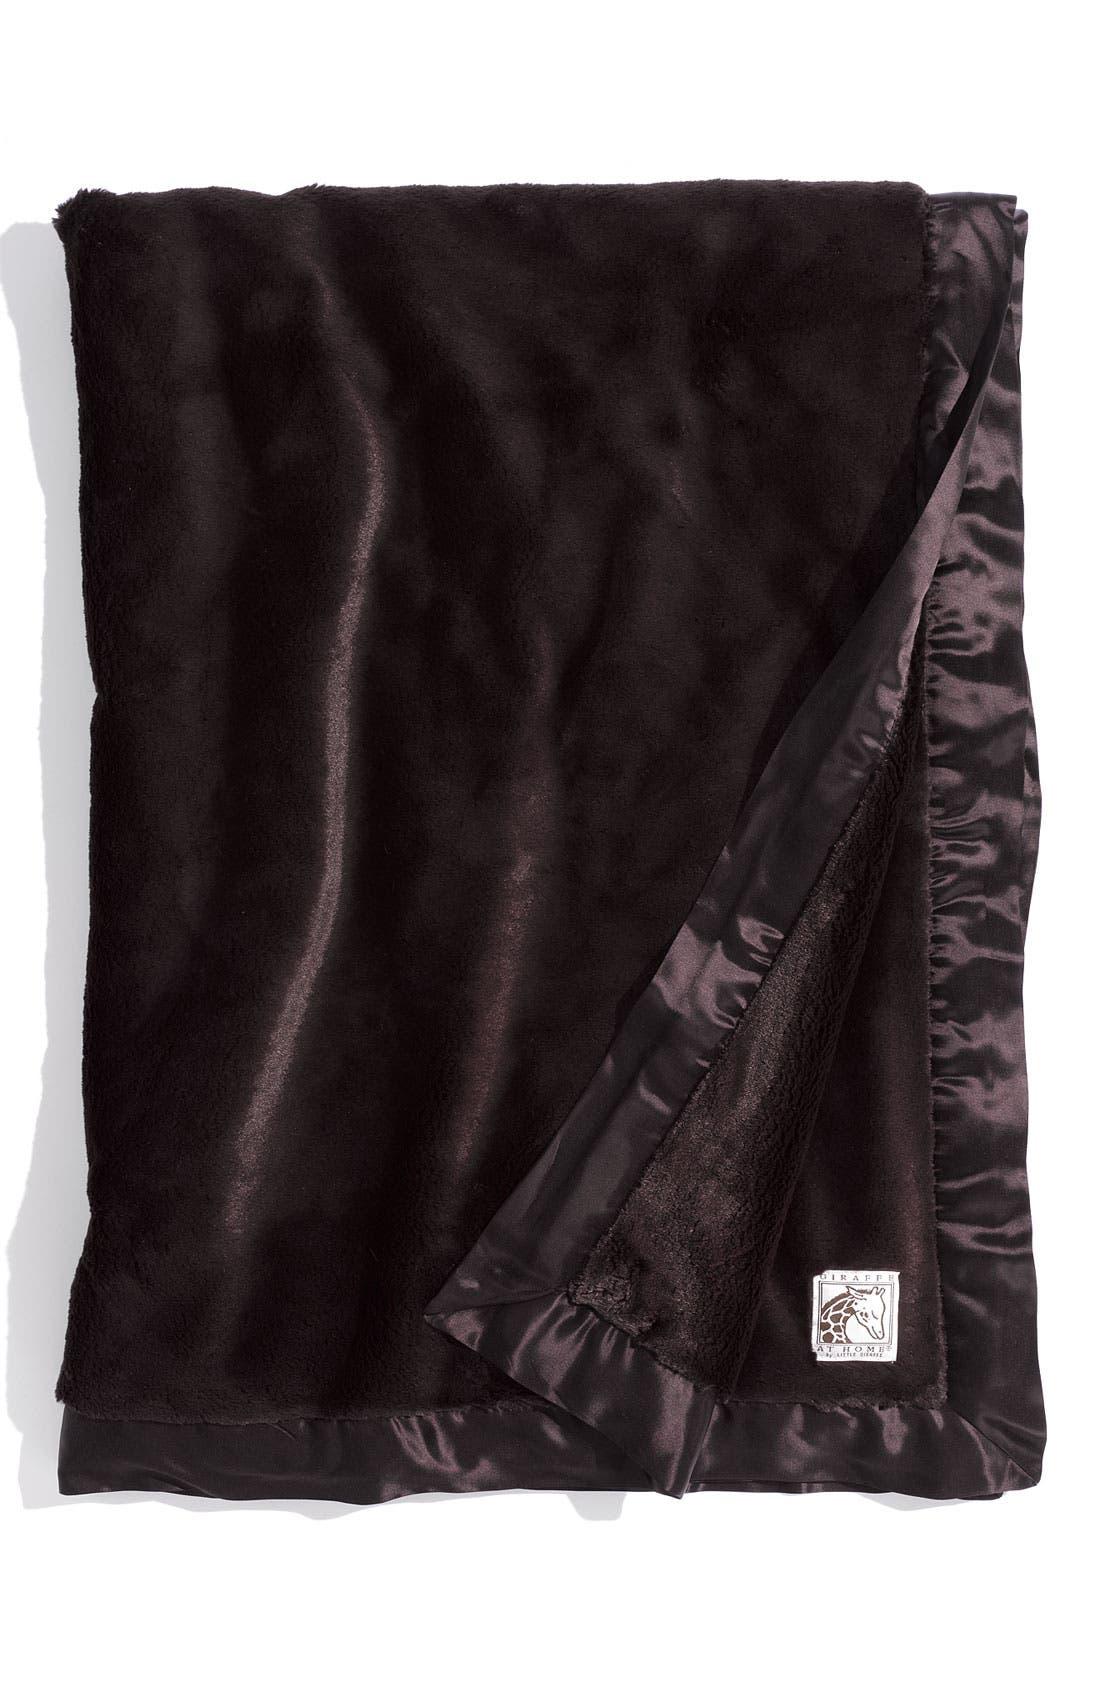 e75b7628551 Throw Blankets   Bed Throws   Wool   Fleece